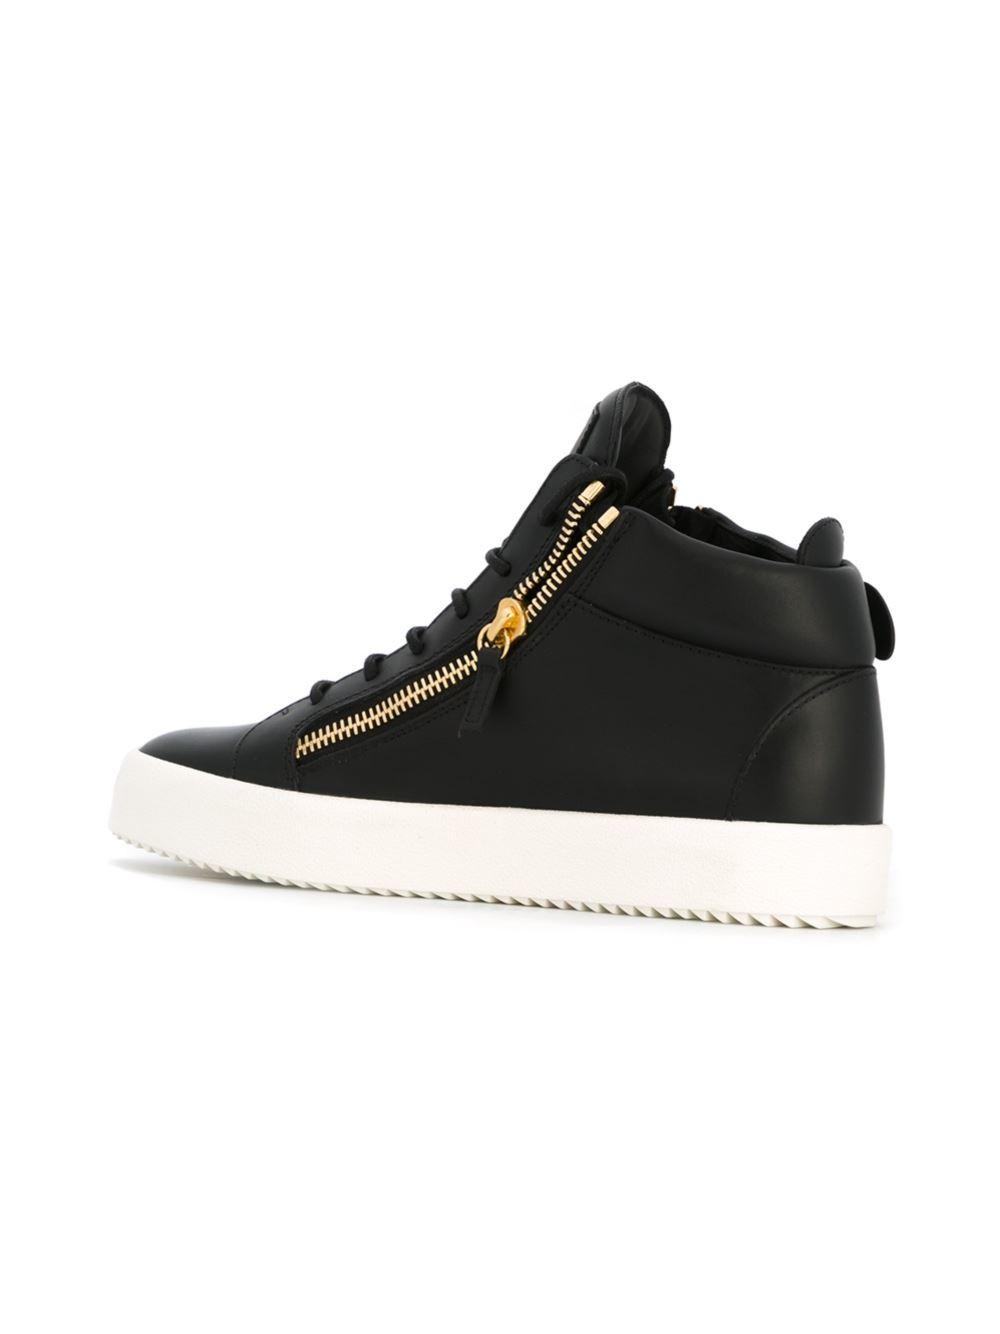 giuseppe zanotti cruel leather hightop sneakers in black